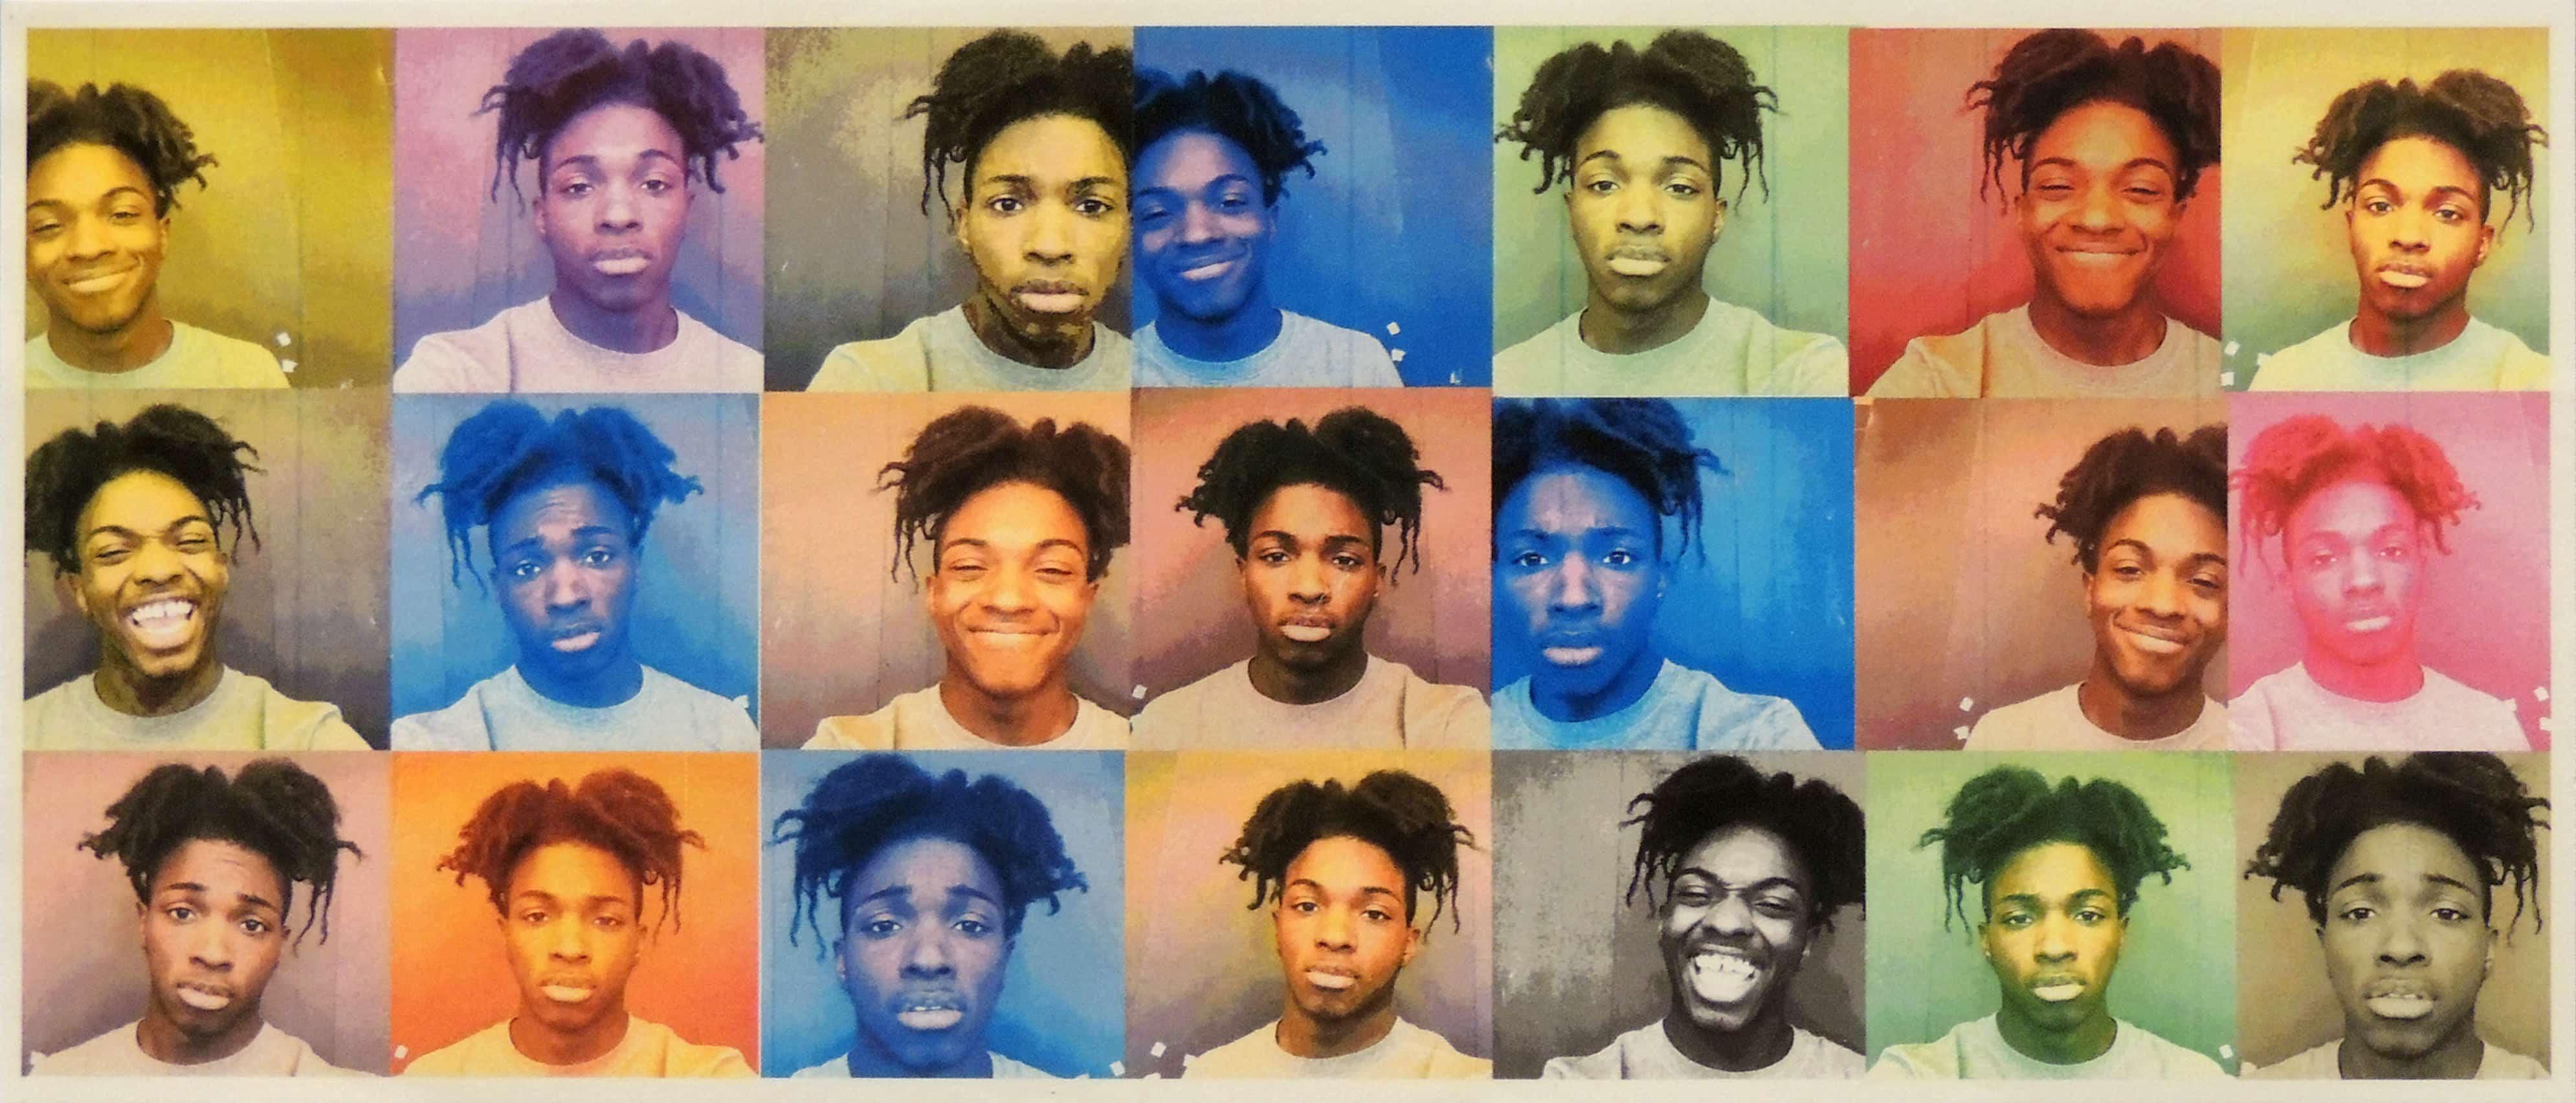 Shawn Daneil | SELF-PORTRAIT | Photoshop, Inspired by Andy Warhol | Shawnee High School Computer Design